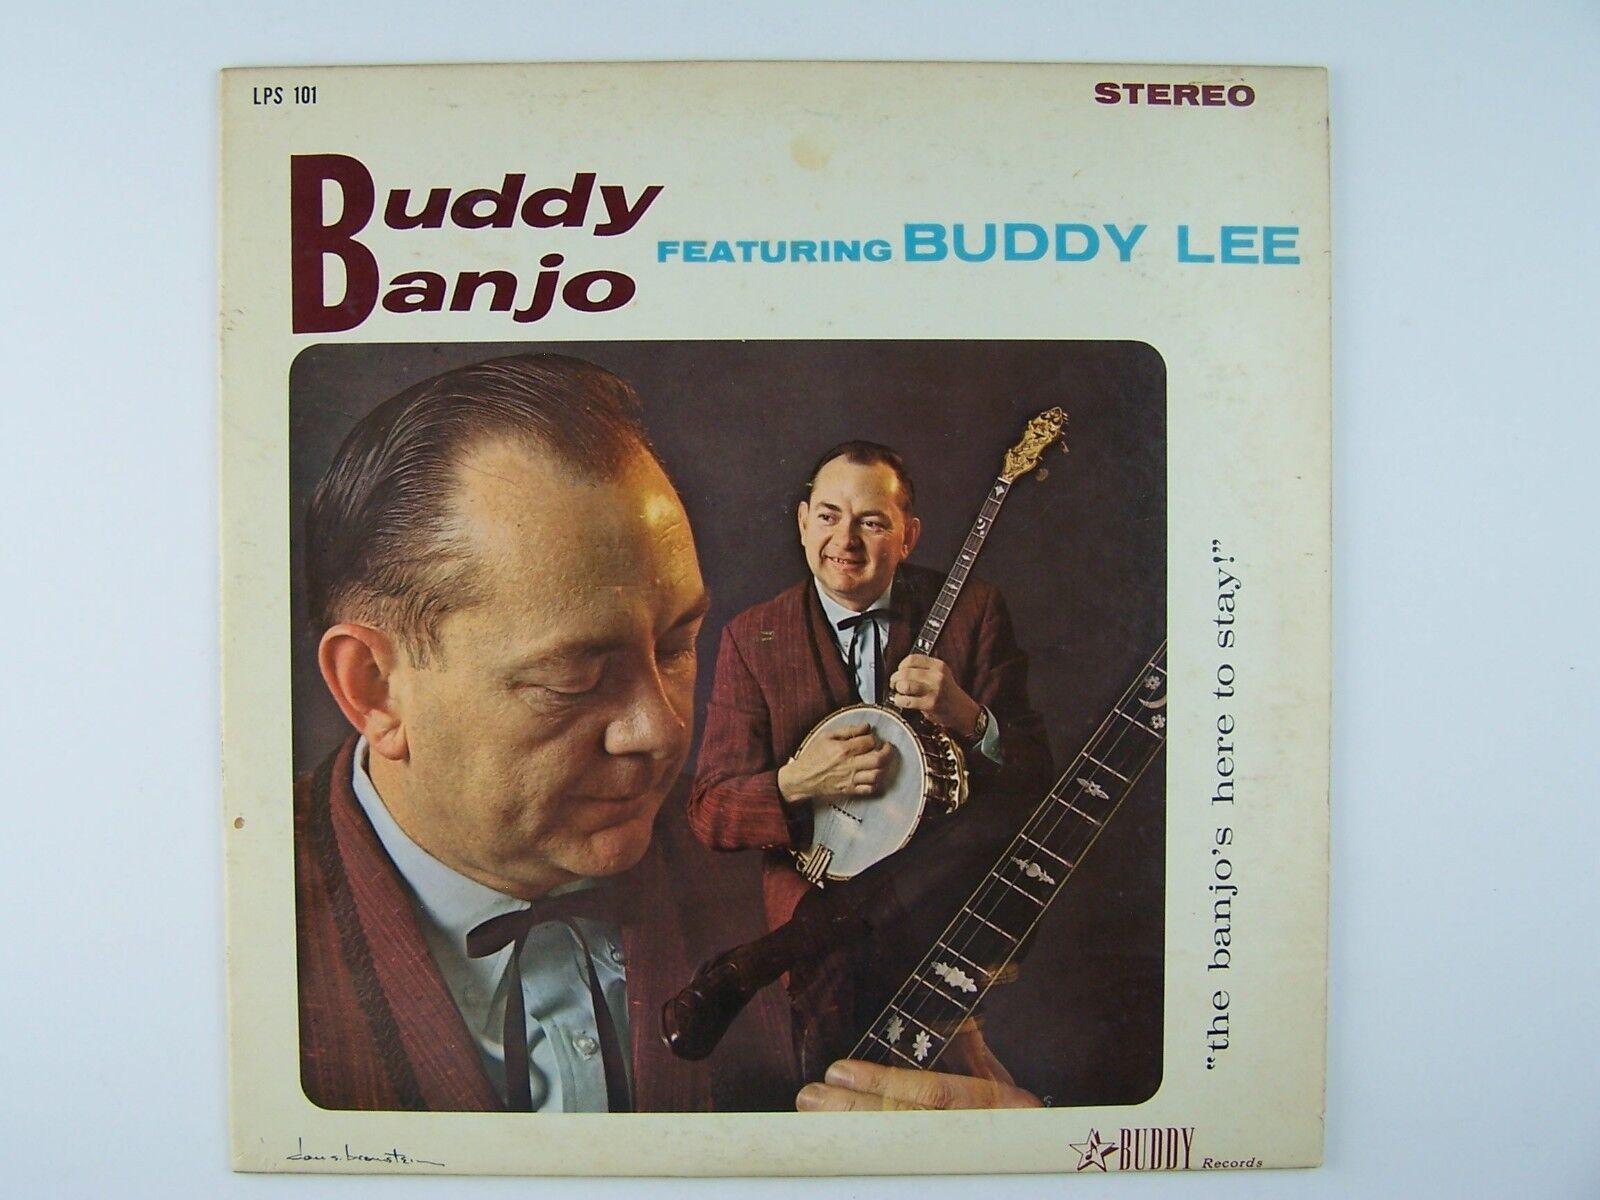 Buddy Lee - Buddy Banjo Featuring Buddy Lee Vinyl LP Re